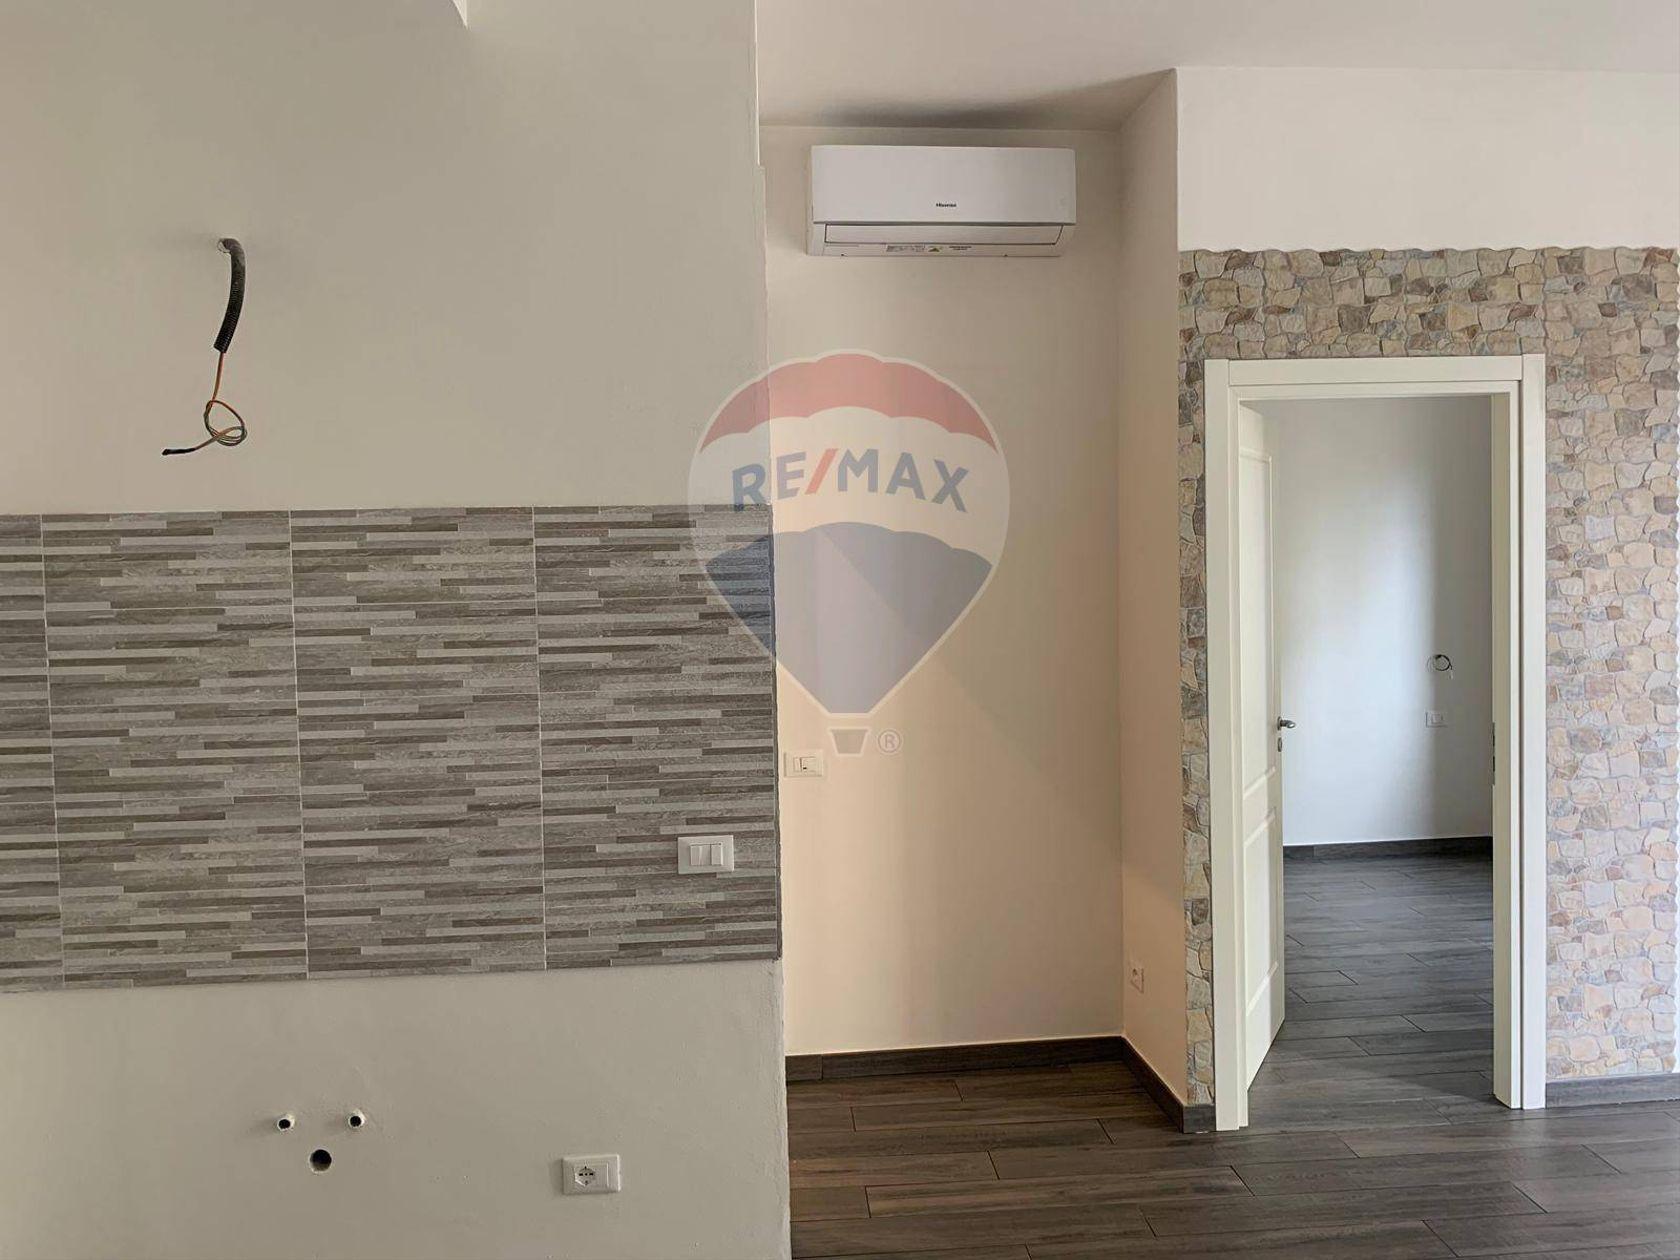 Appartamento San Iacopino, Firenze, FI Vendita - Foto 4